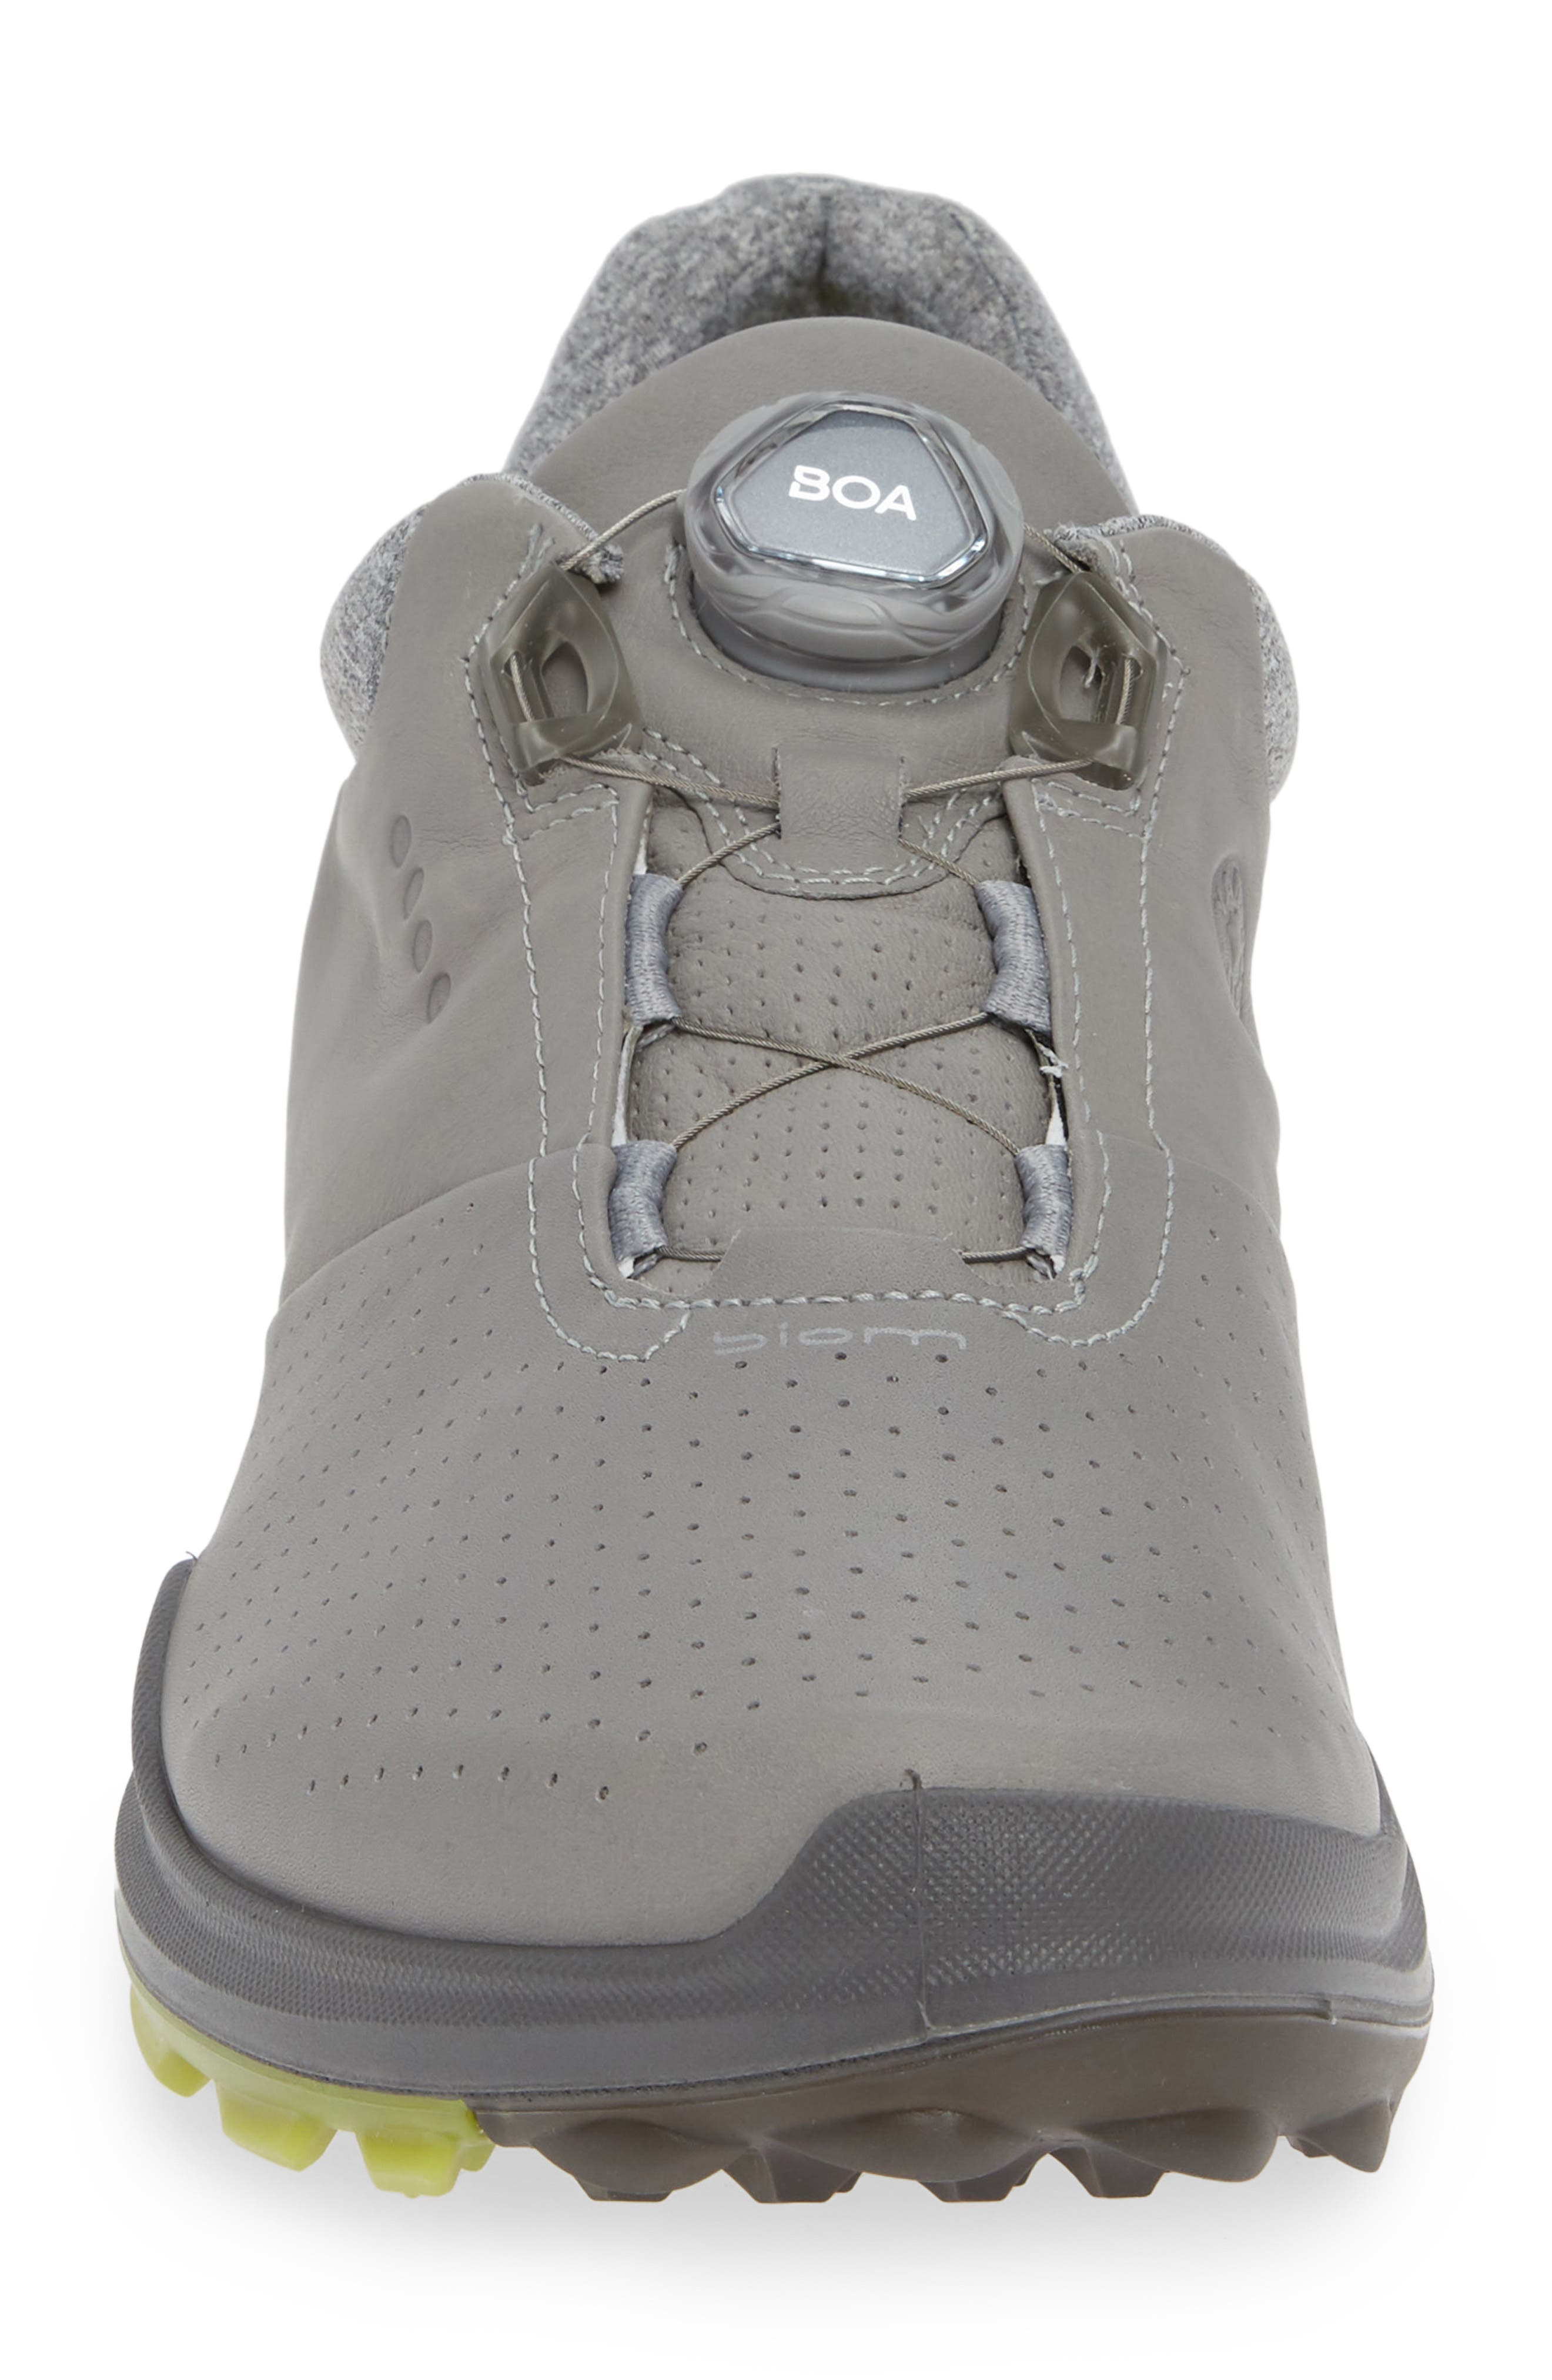 BIOM Hybrid 3 Gore-Tex<sup>®</sup> Golf Shoe,                             Alternate thumbnail 4, color,                             WILD DOVE/ KIWI LEATHER